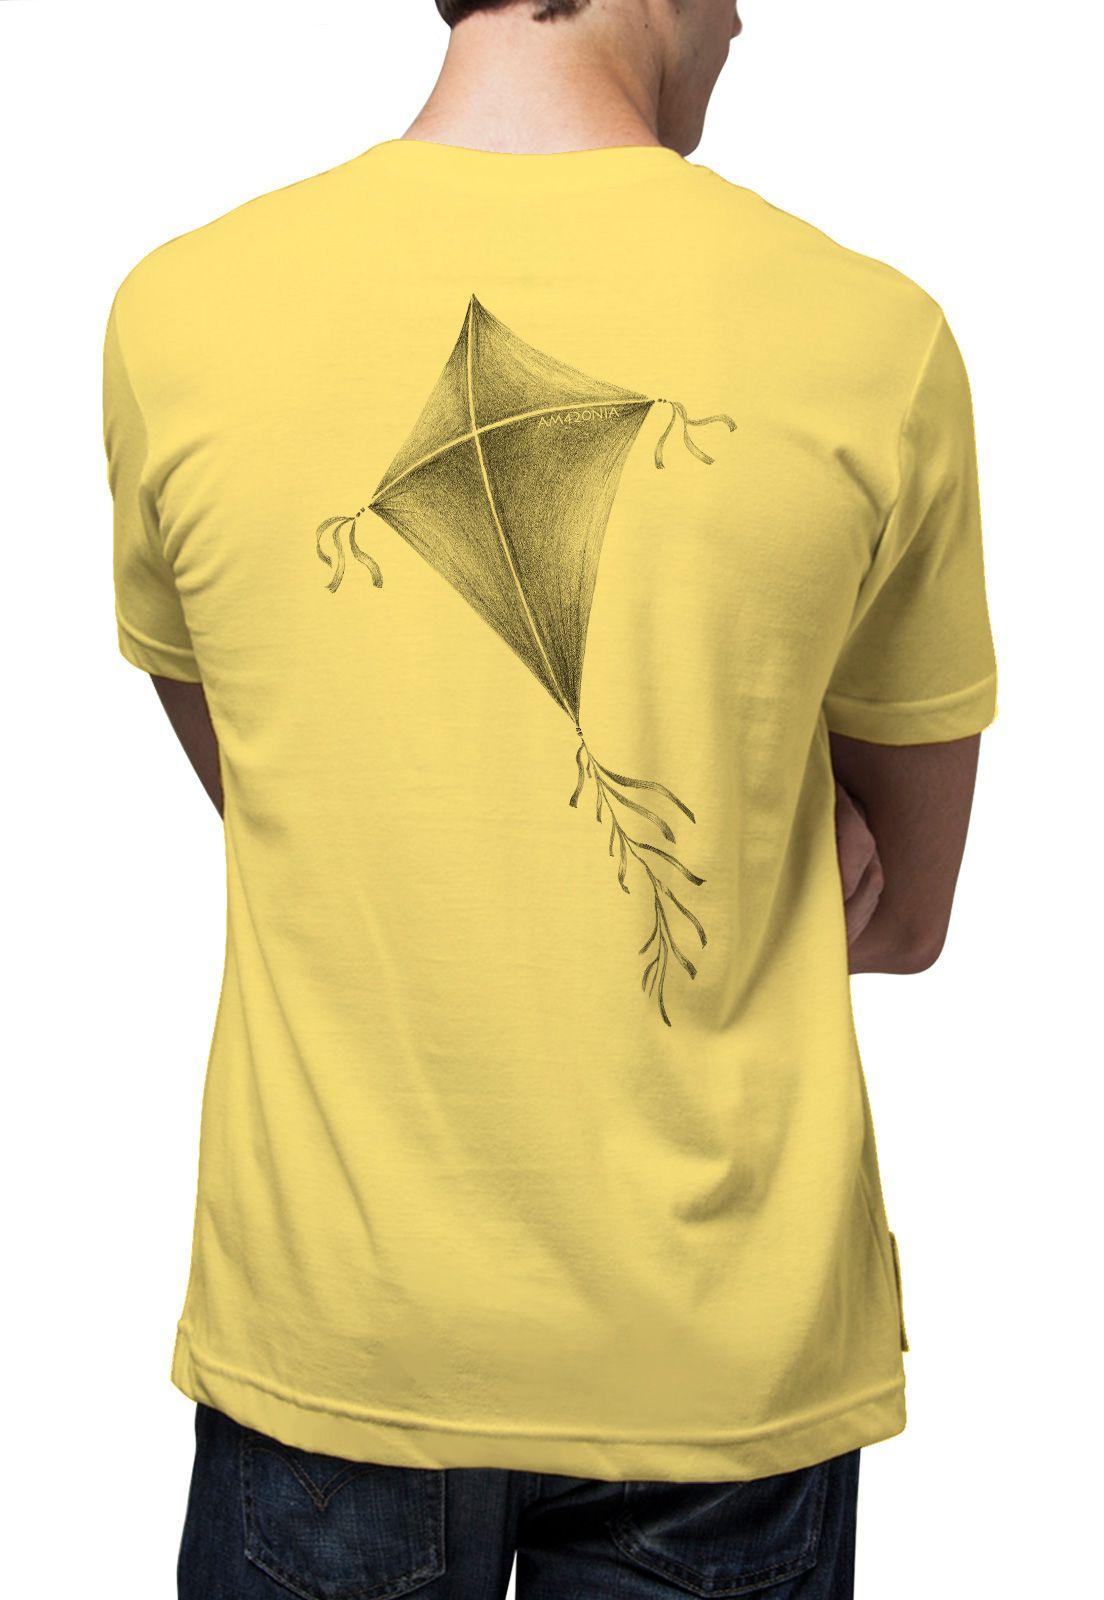 Camiseta Amazônia Pipa - Amarelo